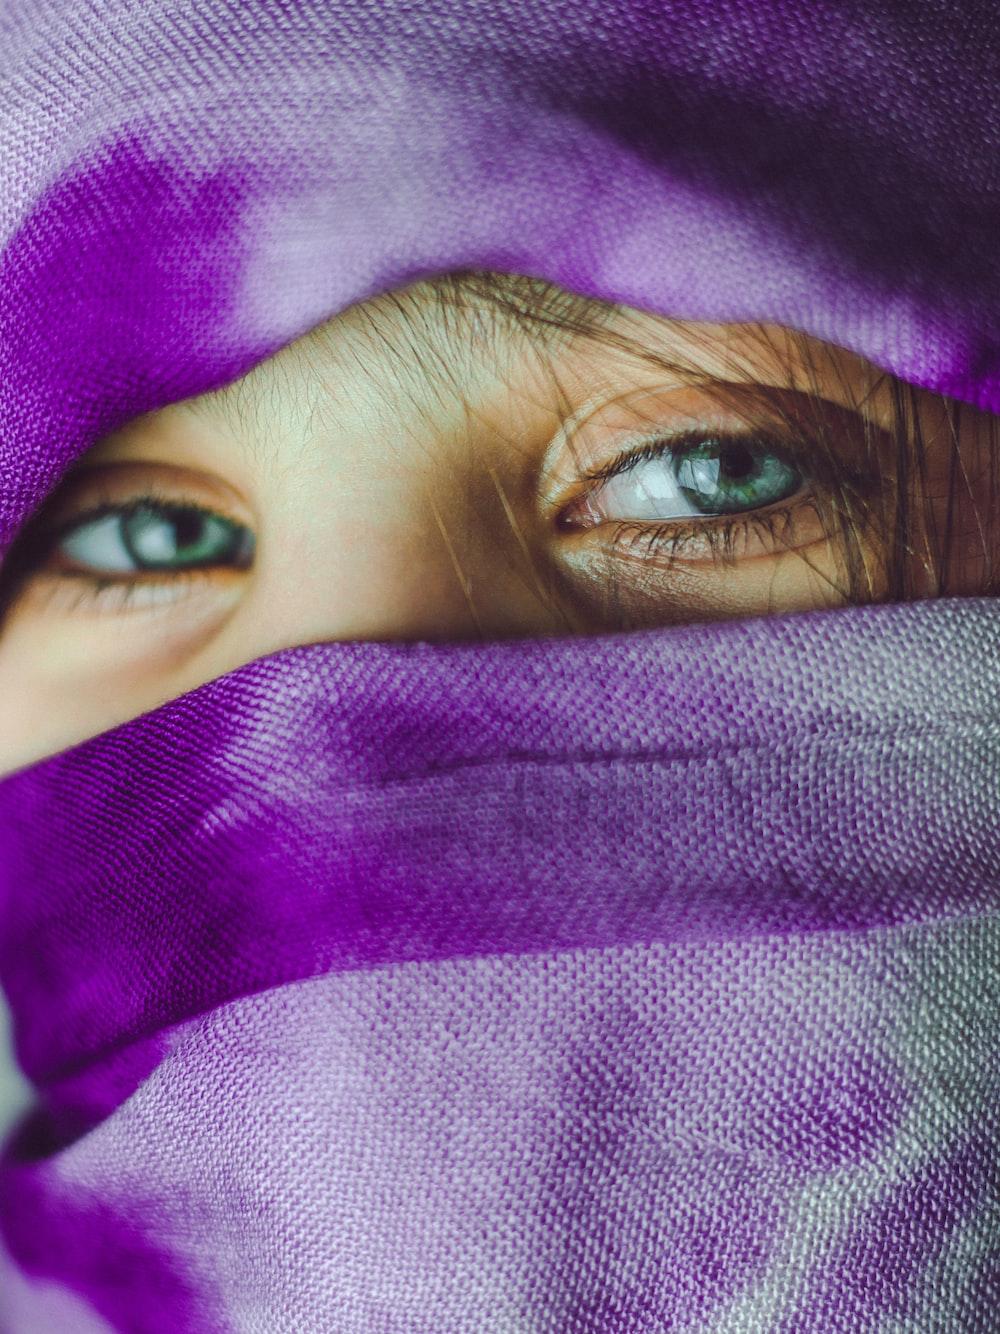 person wearing niqab